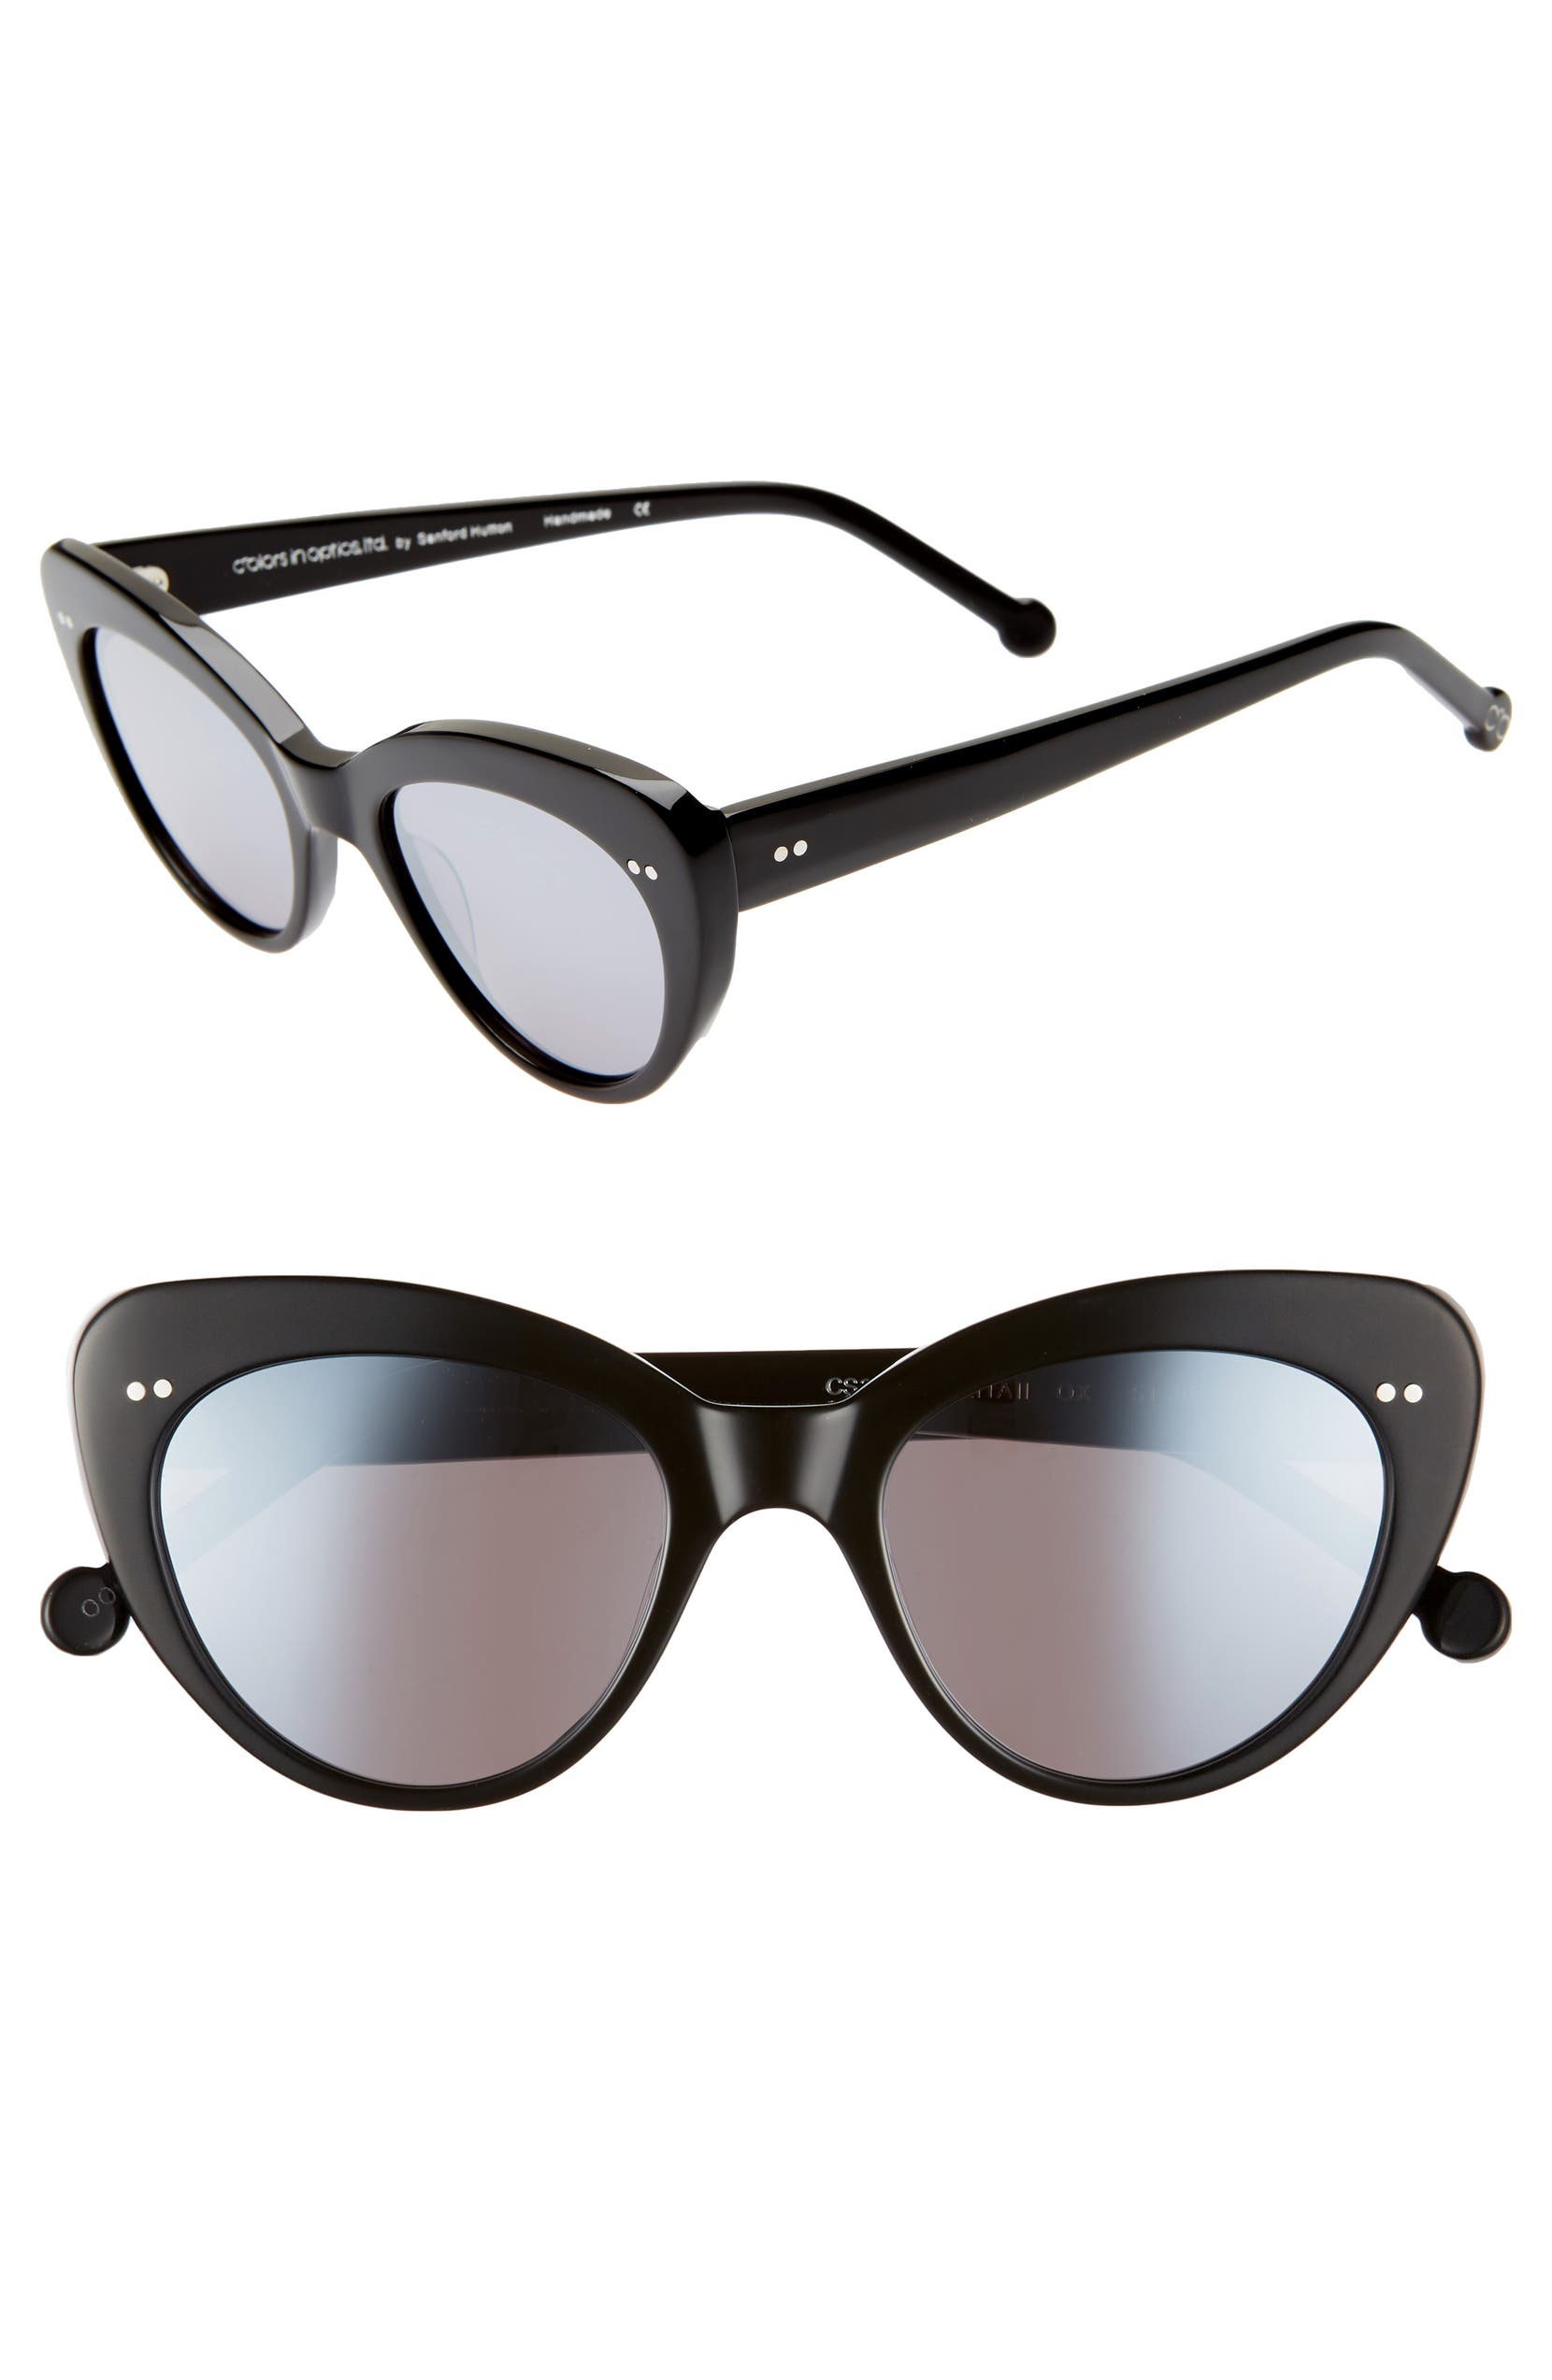 4ed643e9eb5 Colors In Optics Lolita 51mm Gradient Lens Cat Eye Sunglasses ...